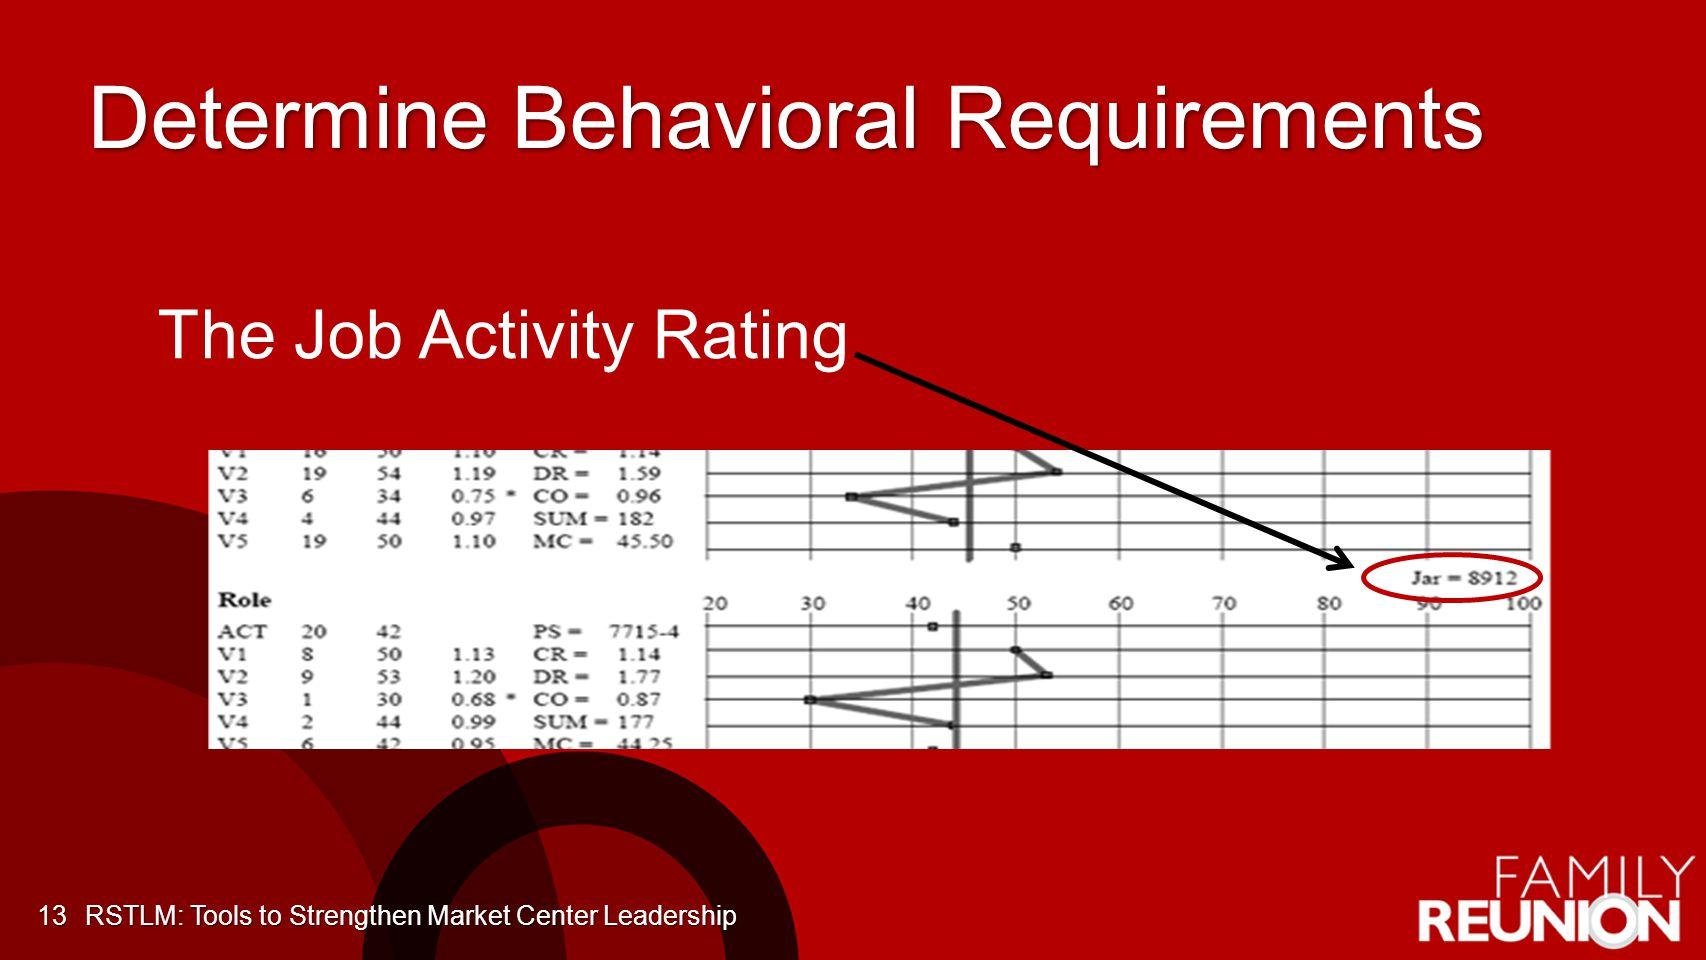 Determine Behavioral Requirements